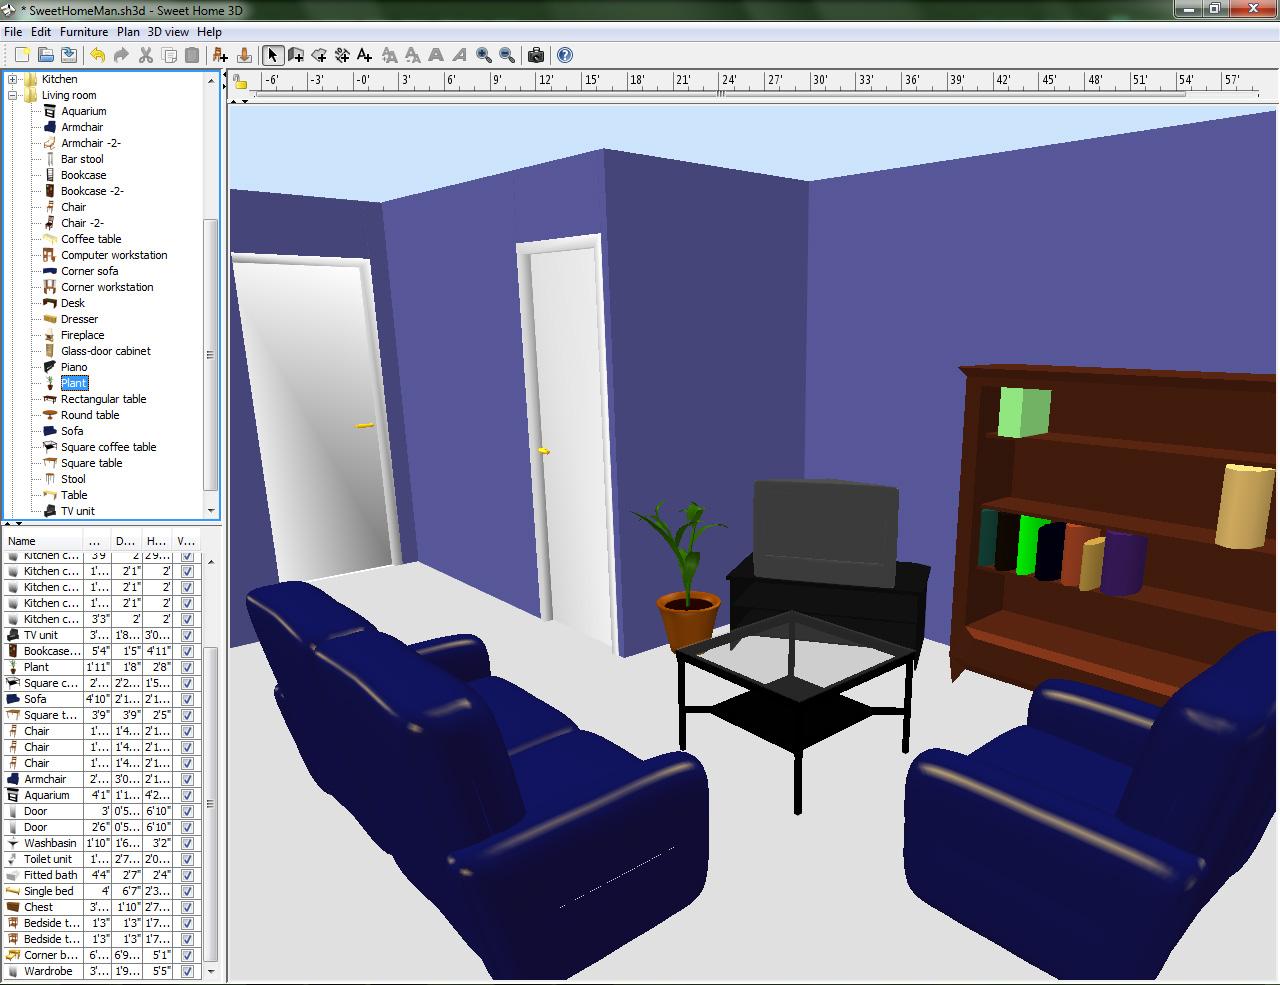 ... low-cost-house-3d-floor-plans-design-my-room-interior-design-tool.jpg